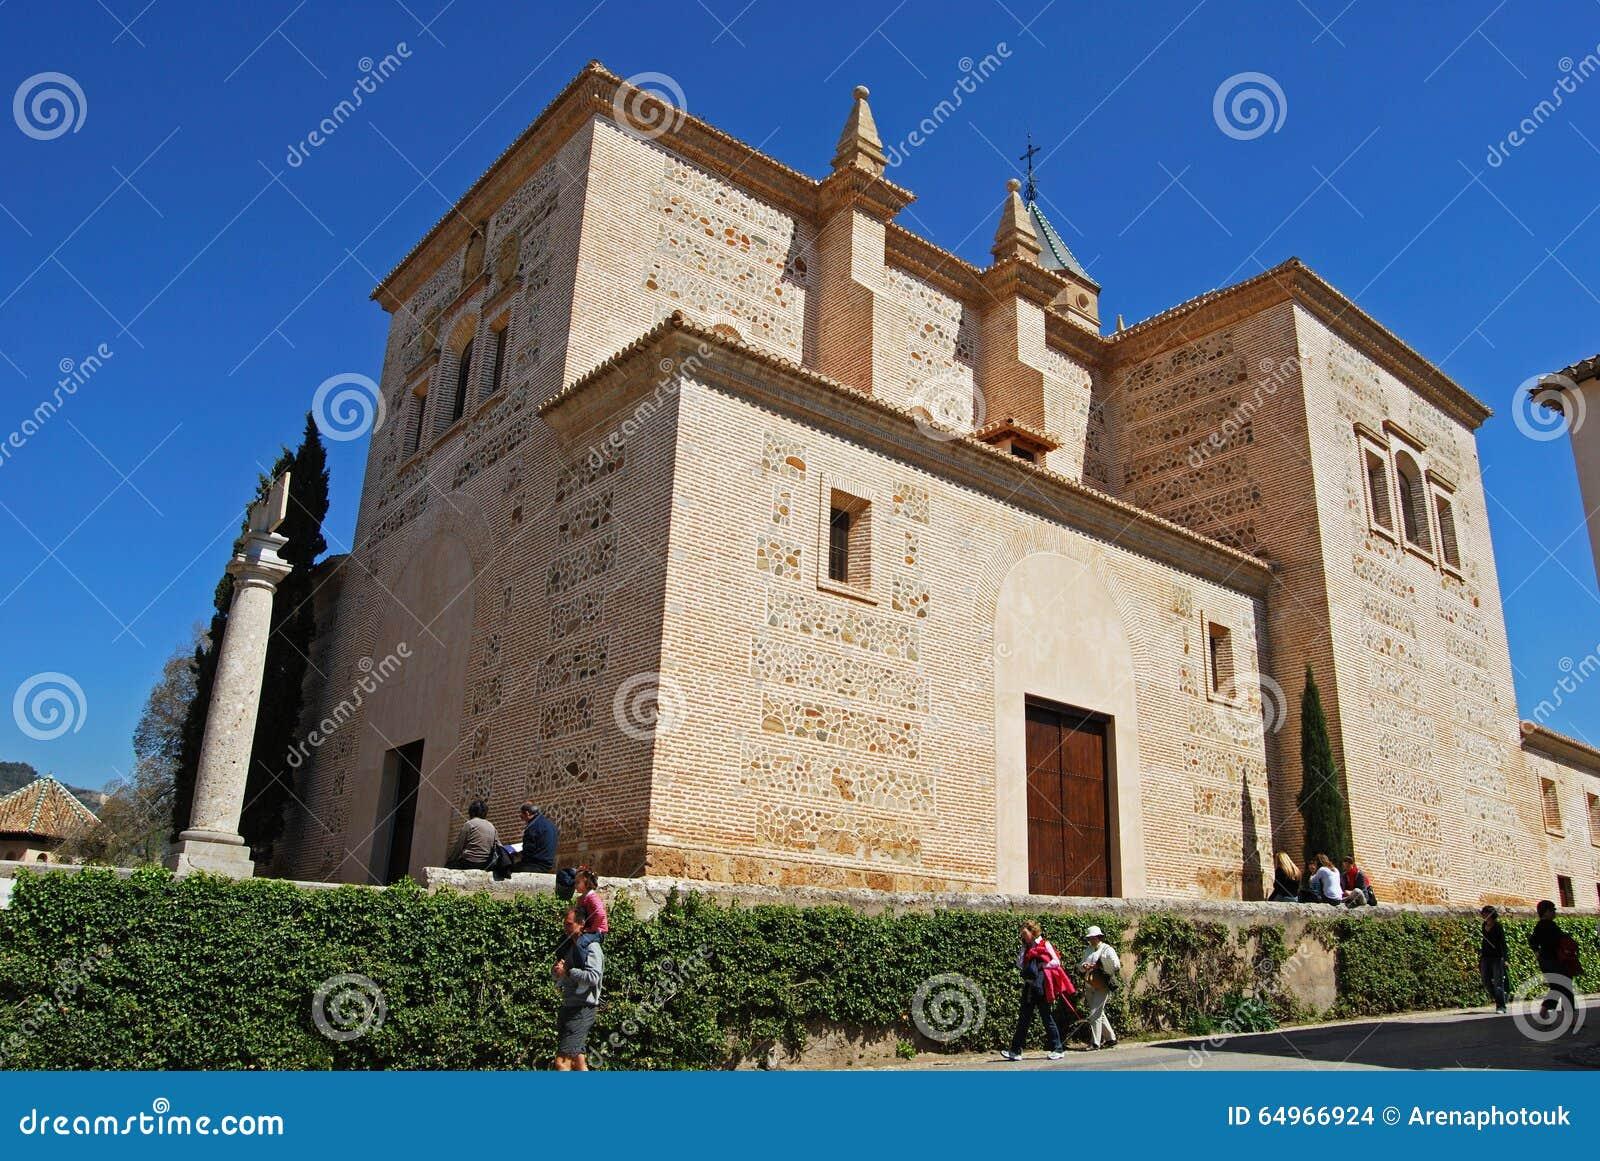 Igreja de Santa Maria, Alhambra Palace